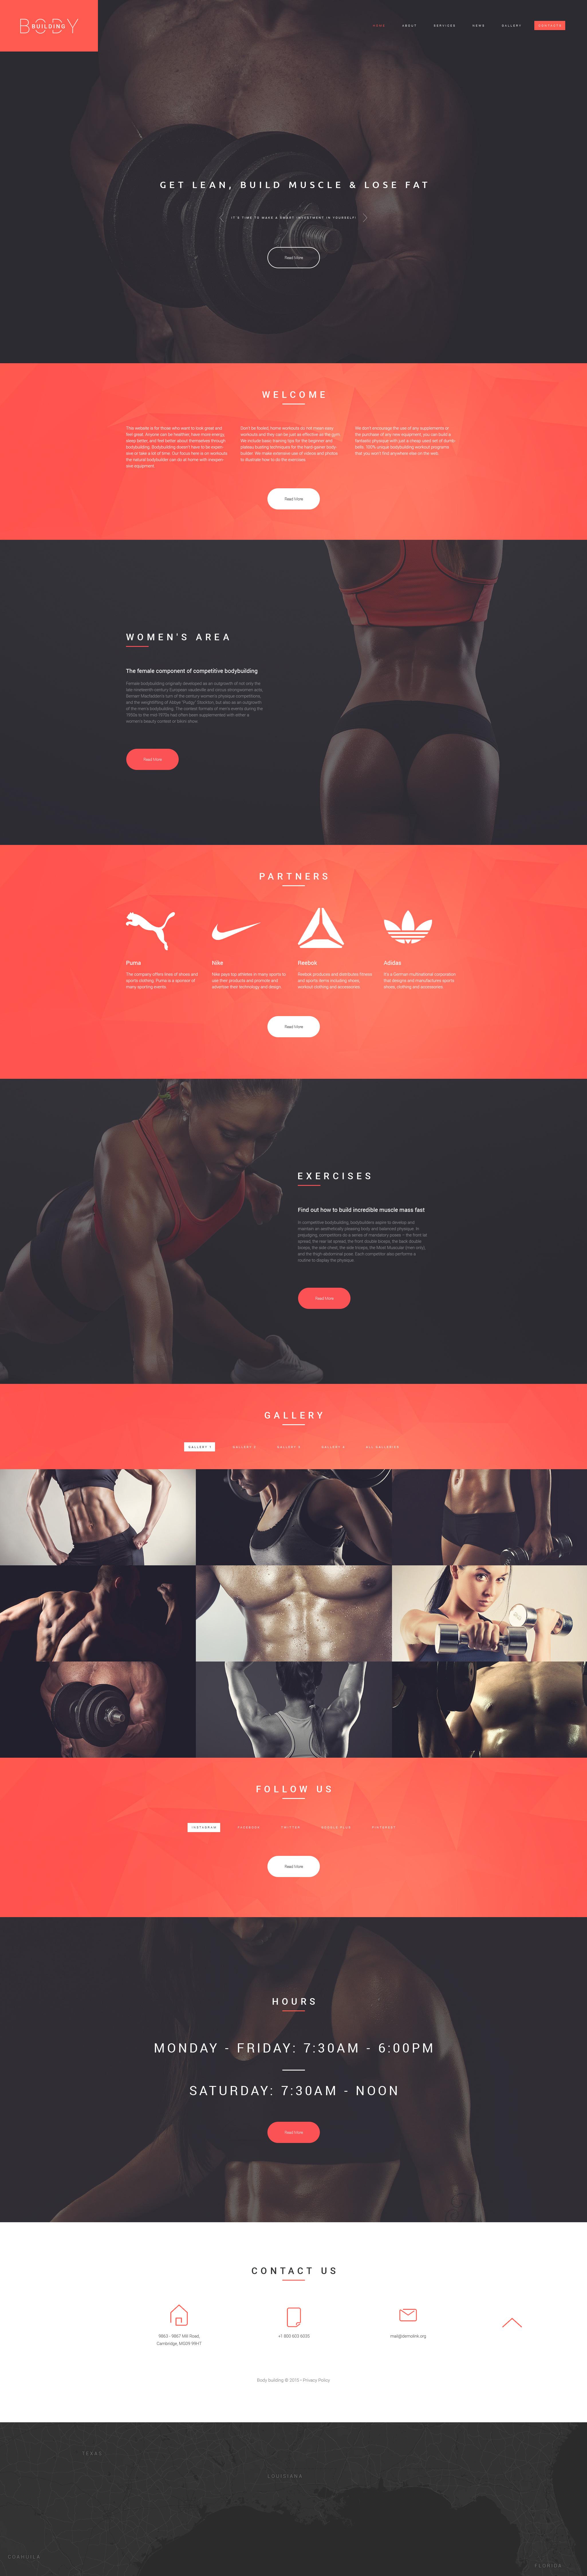 Bodybuilders' Club Website Template